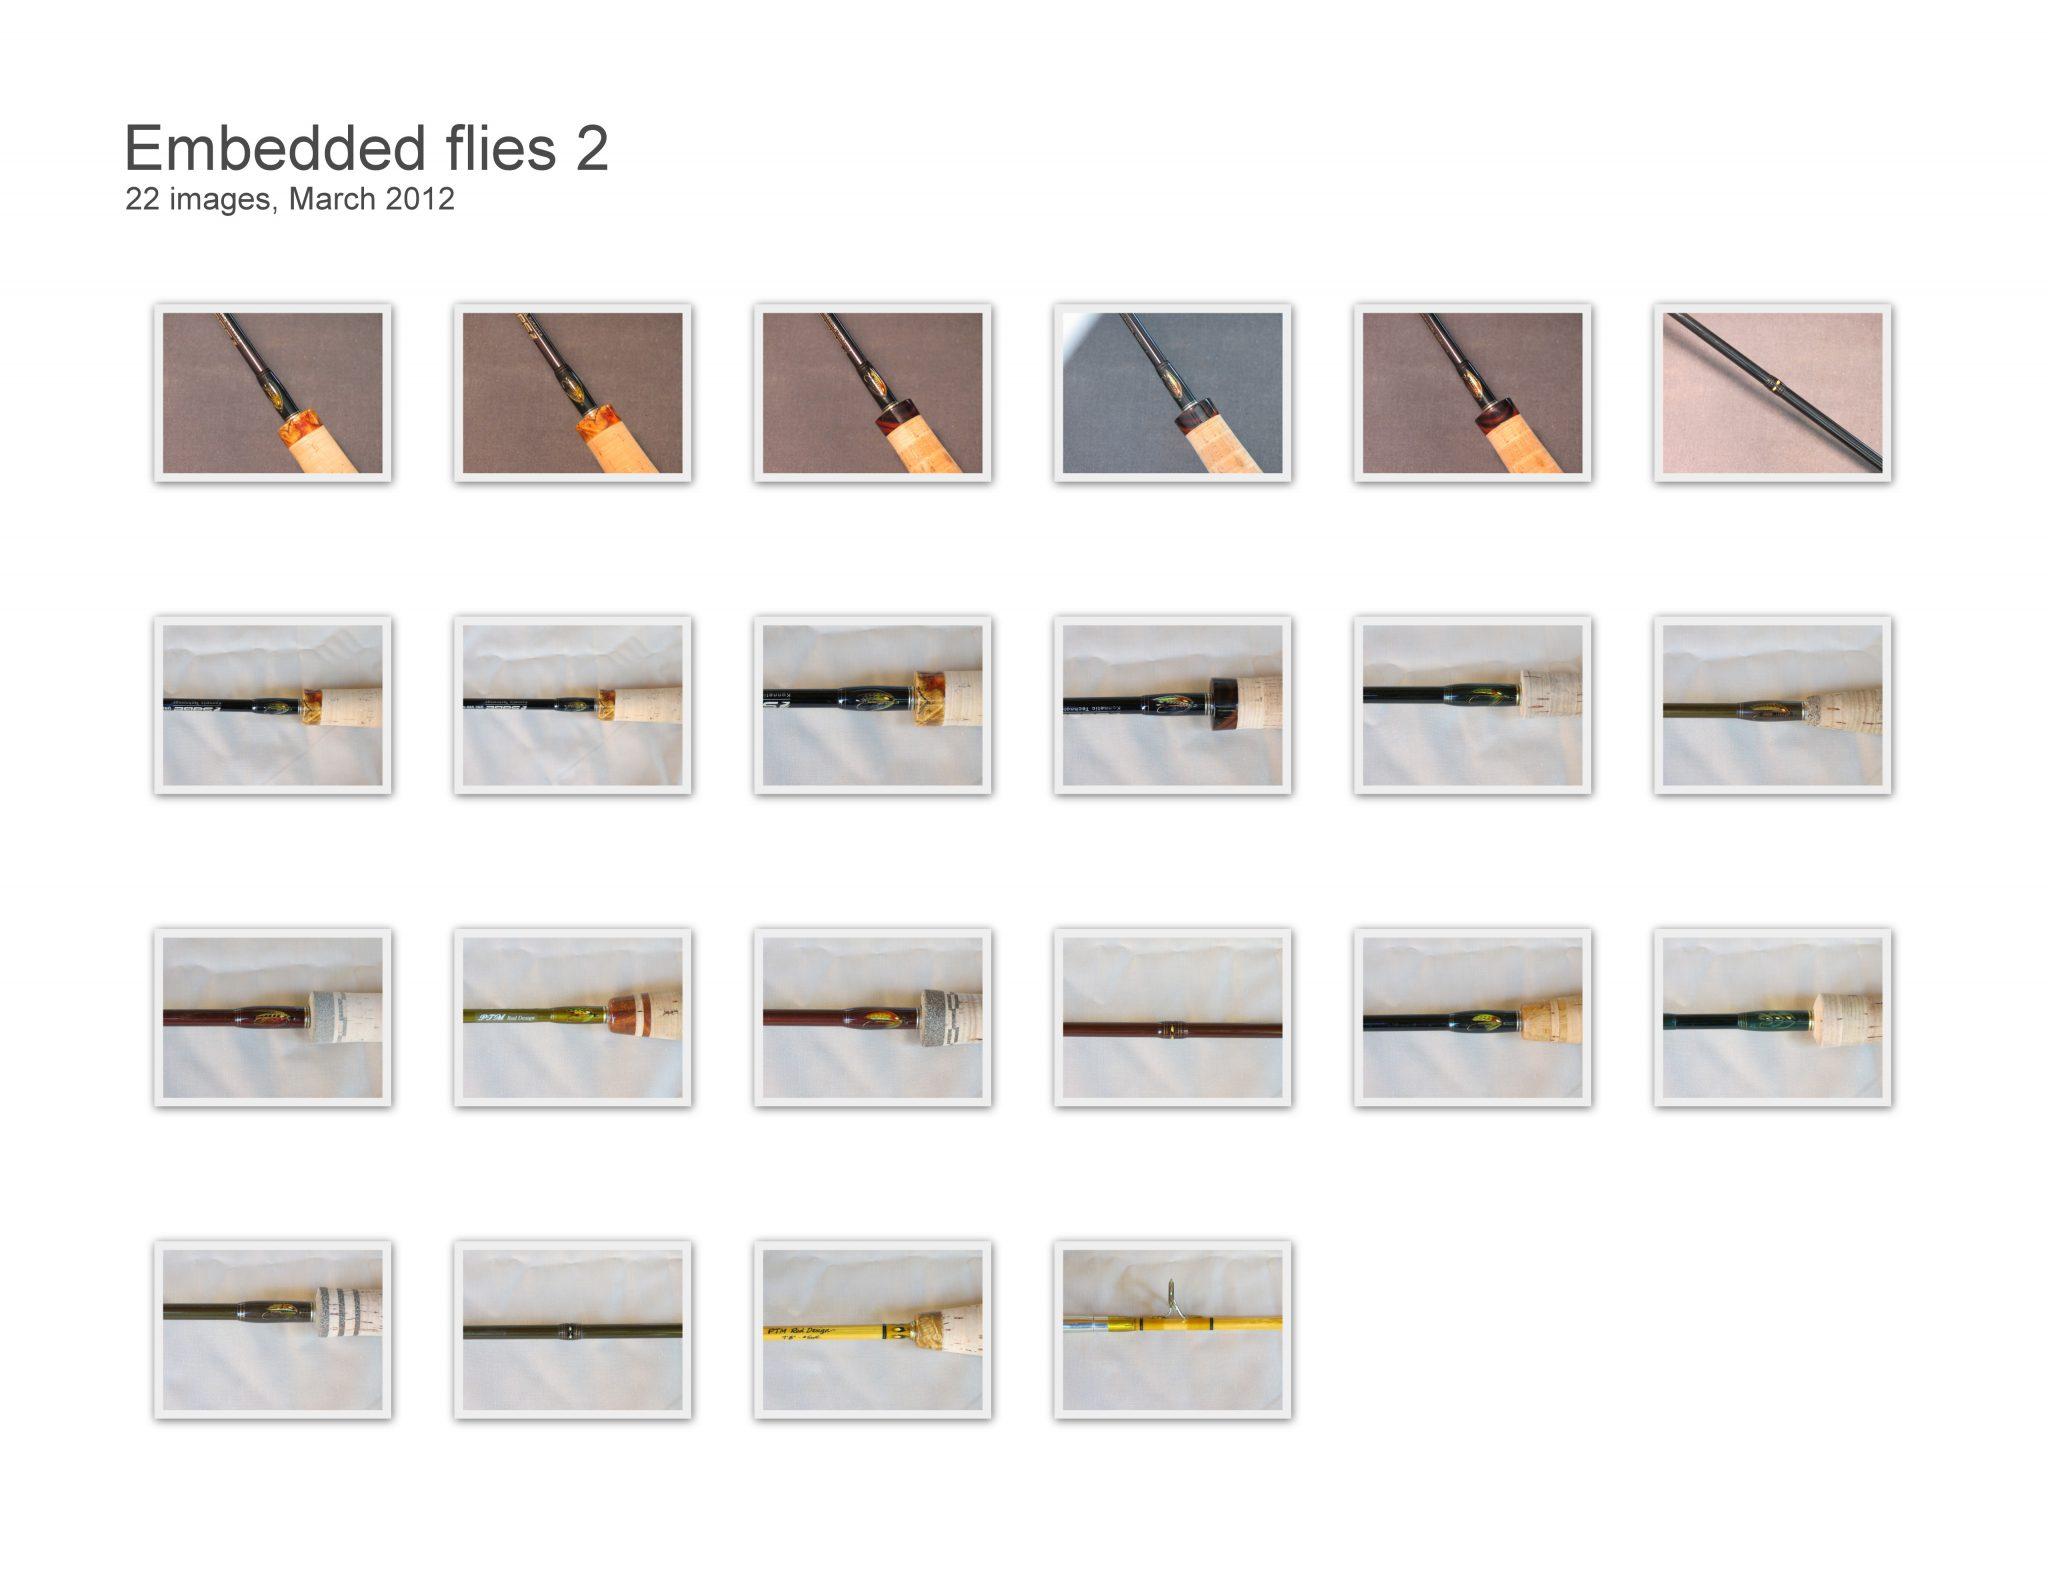 Embedded flies 2